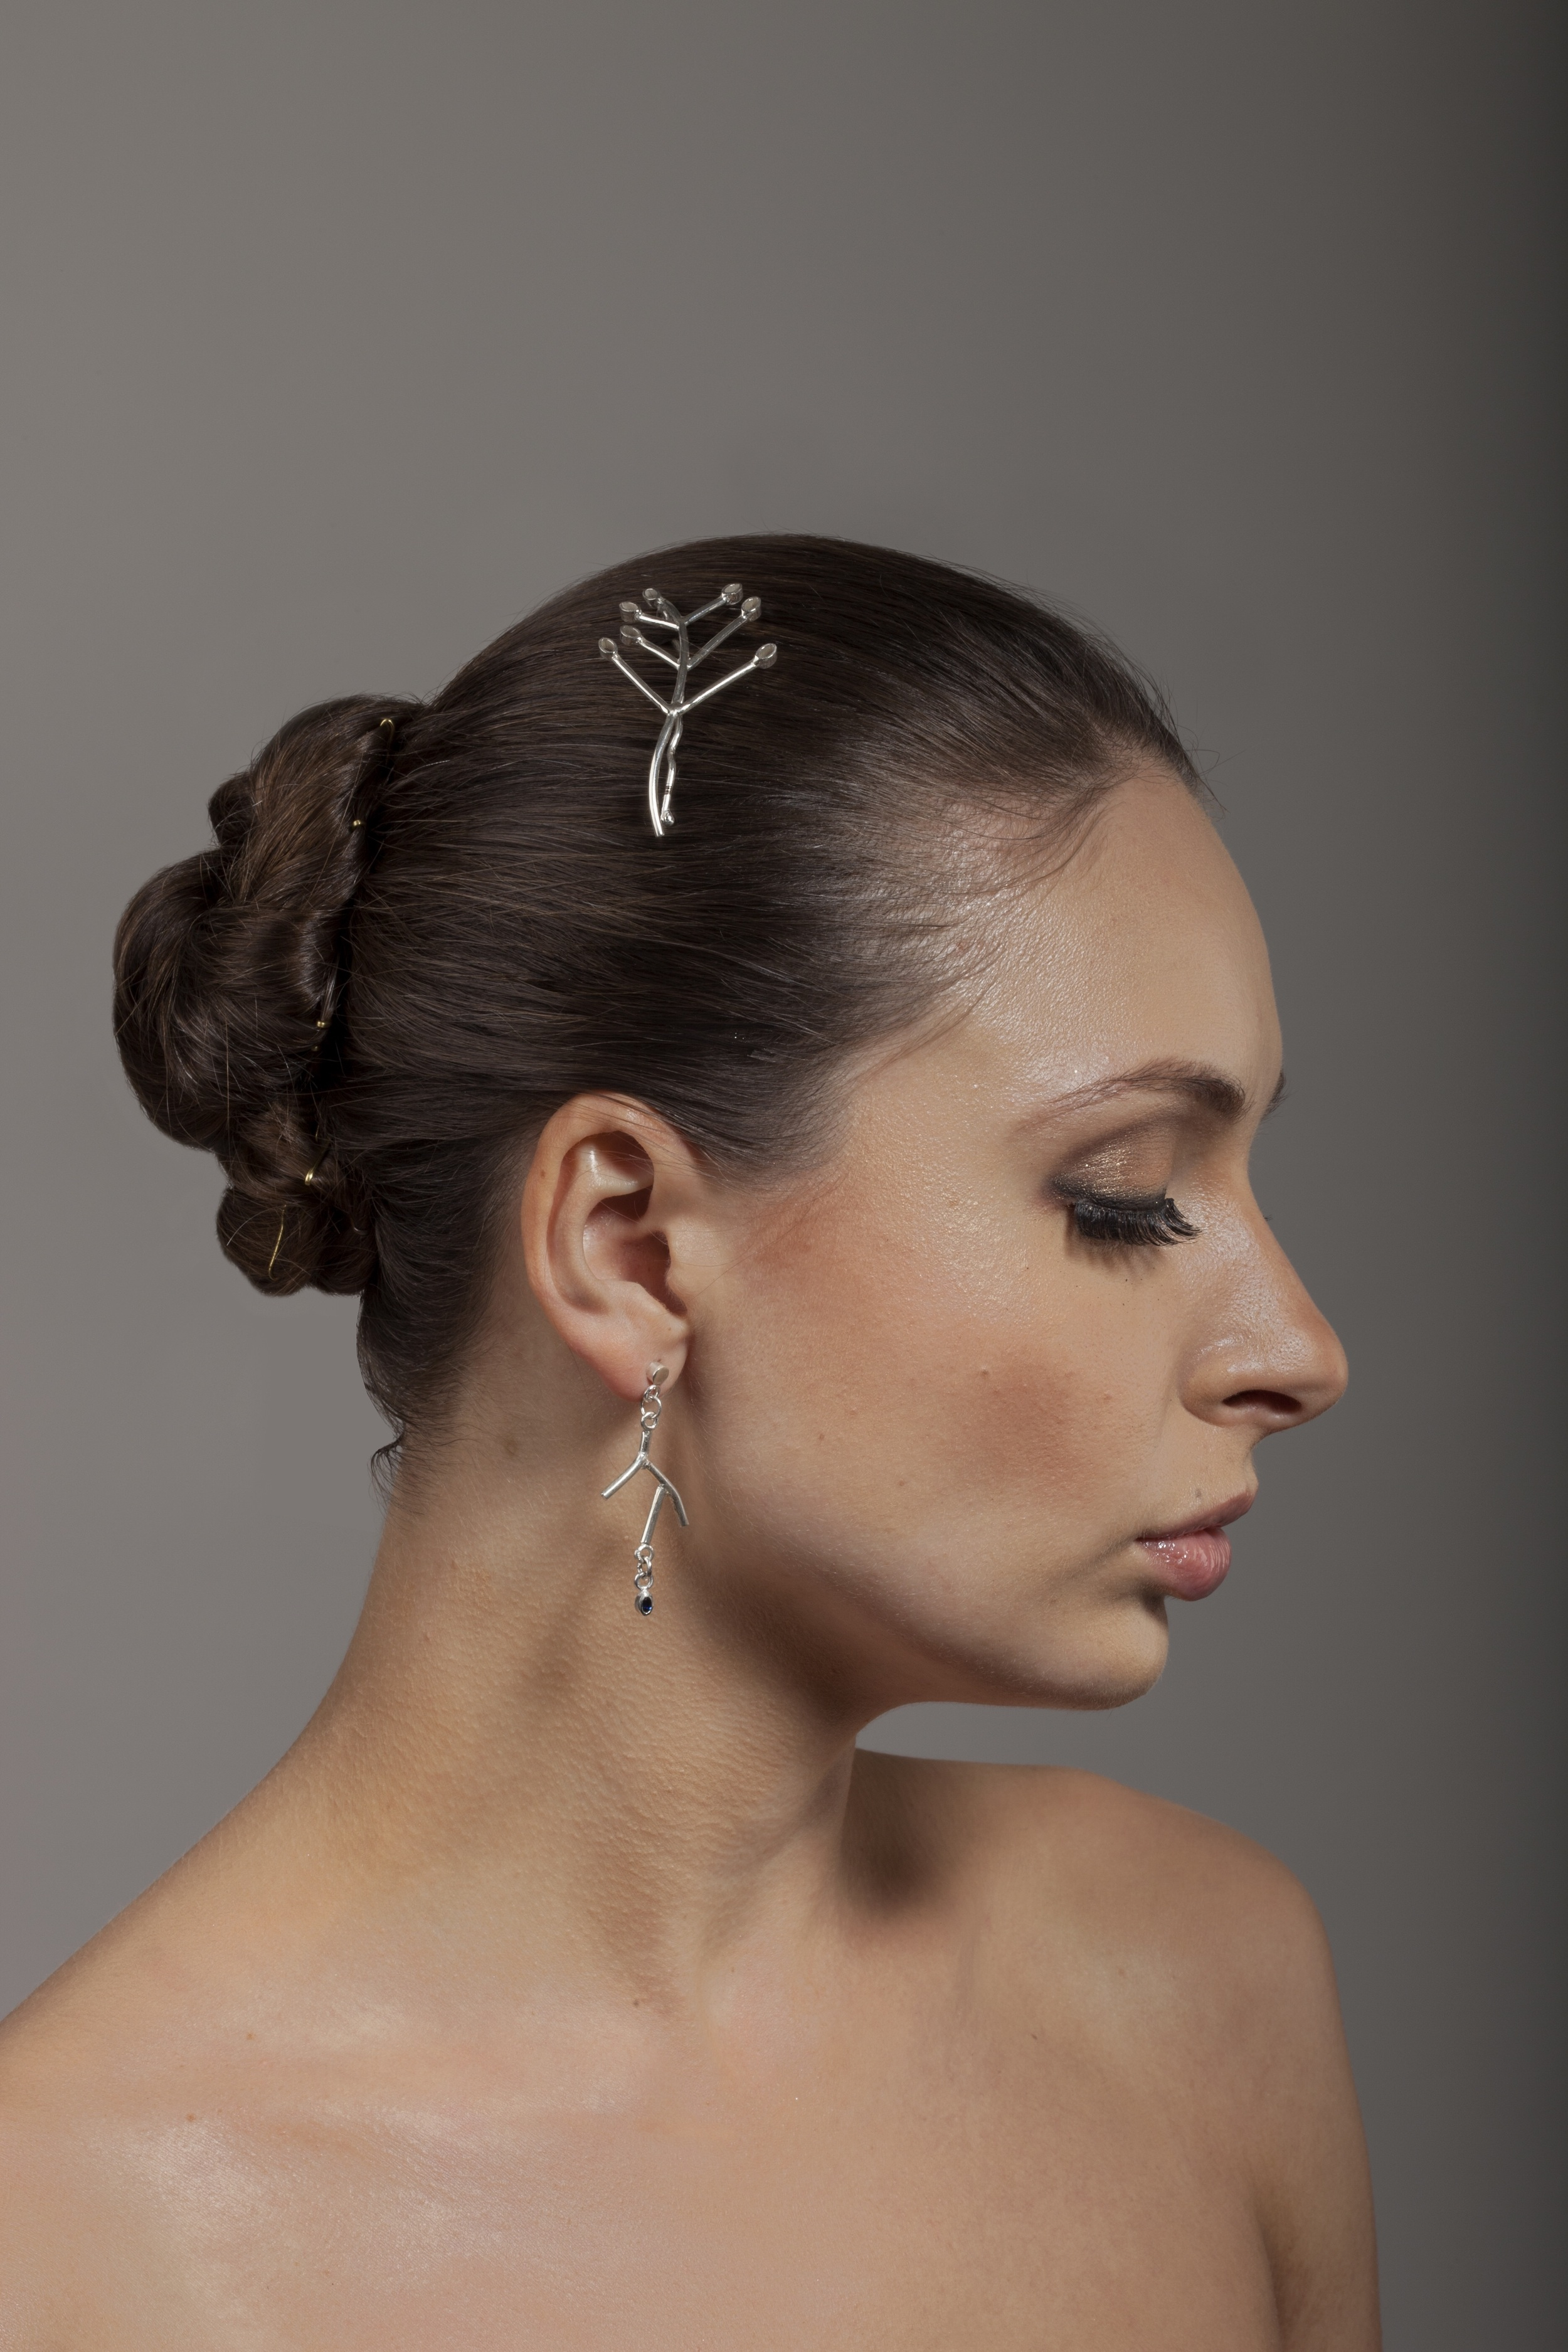 Twig earrings and hair slides - Farah Qureshi.